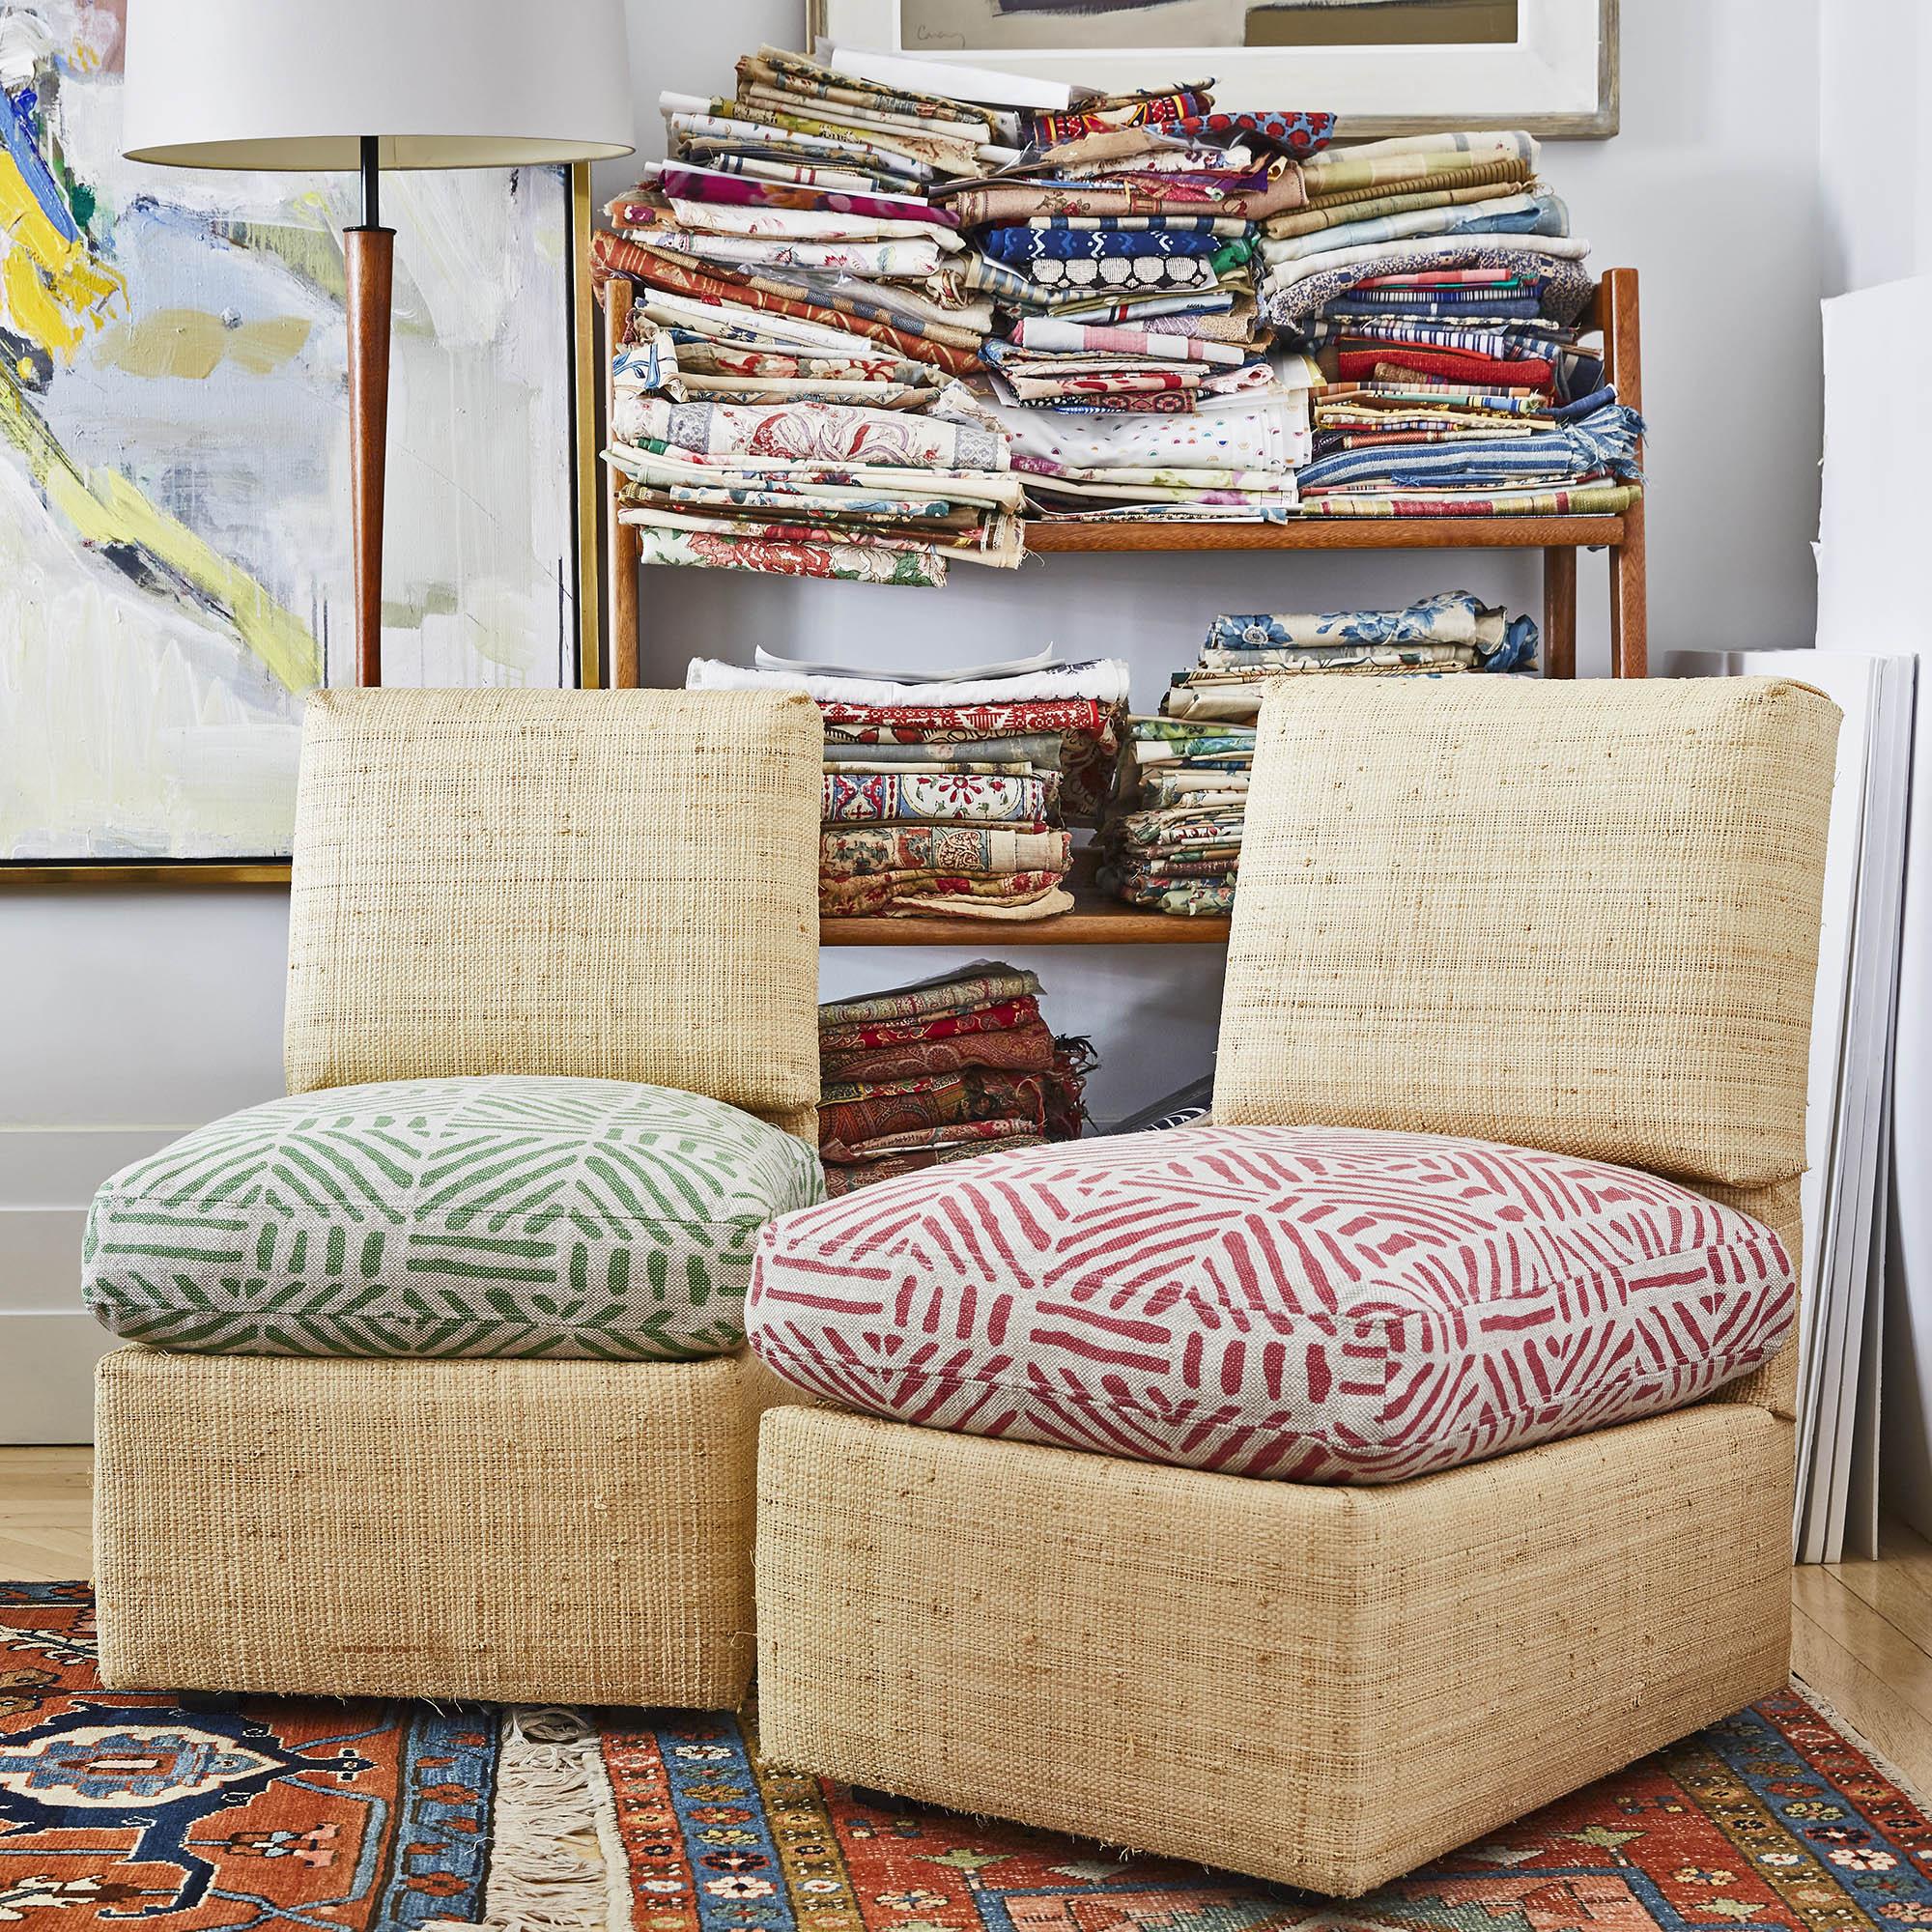 linwood_chairs2.jpg